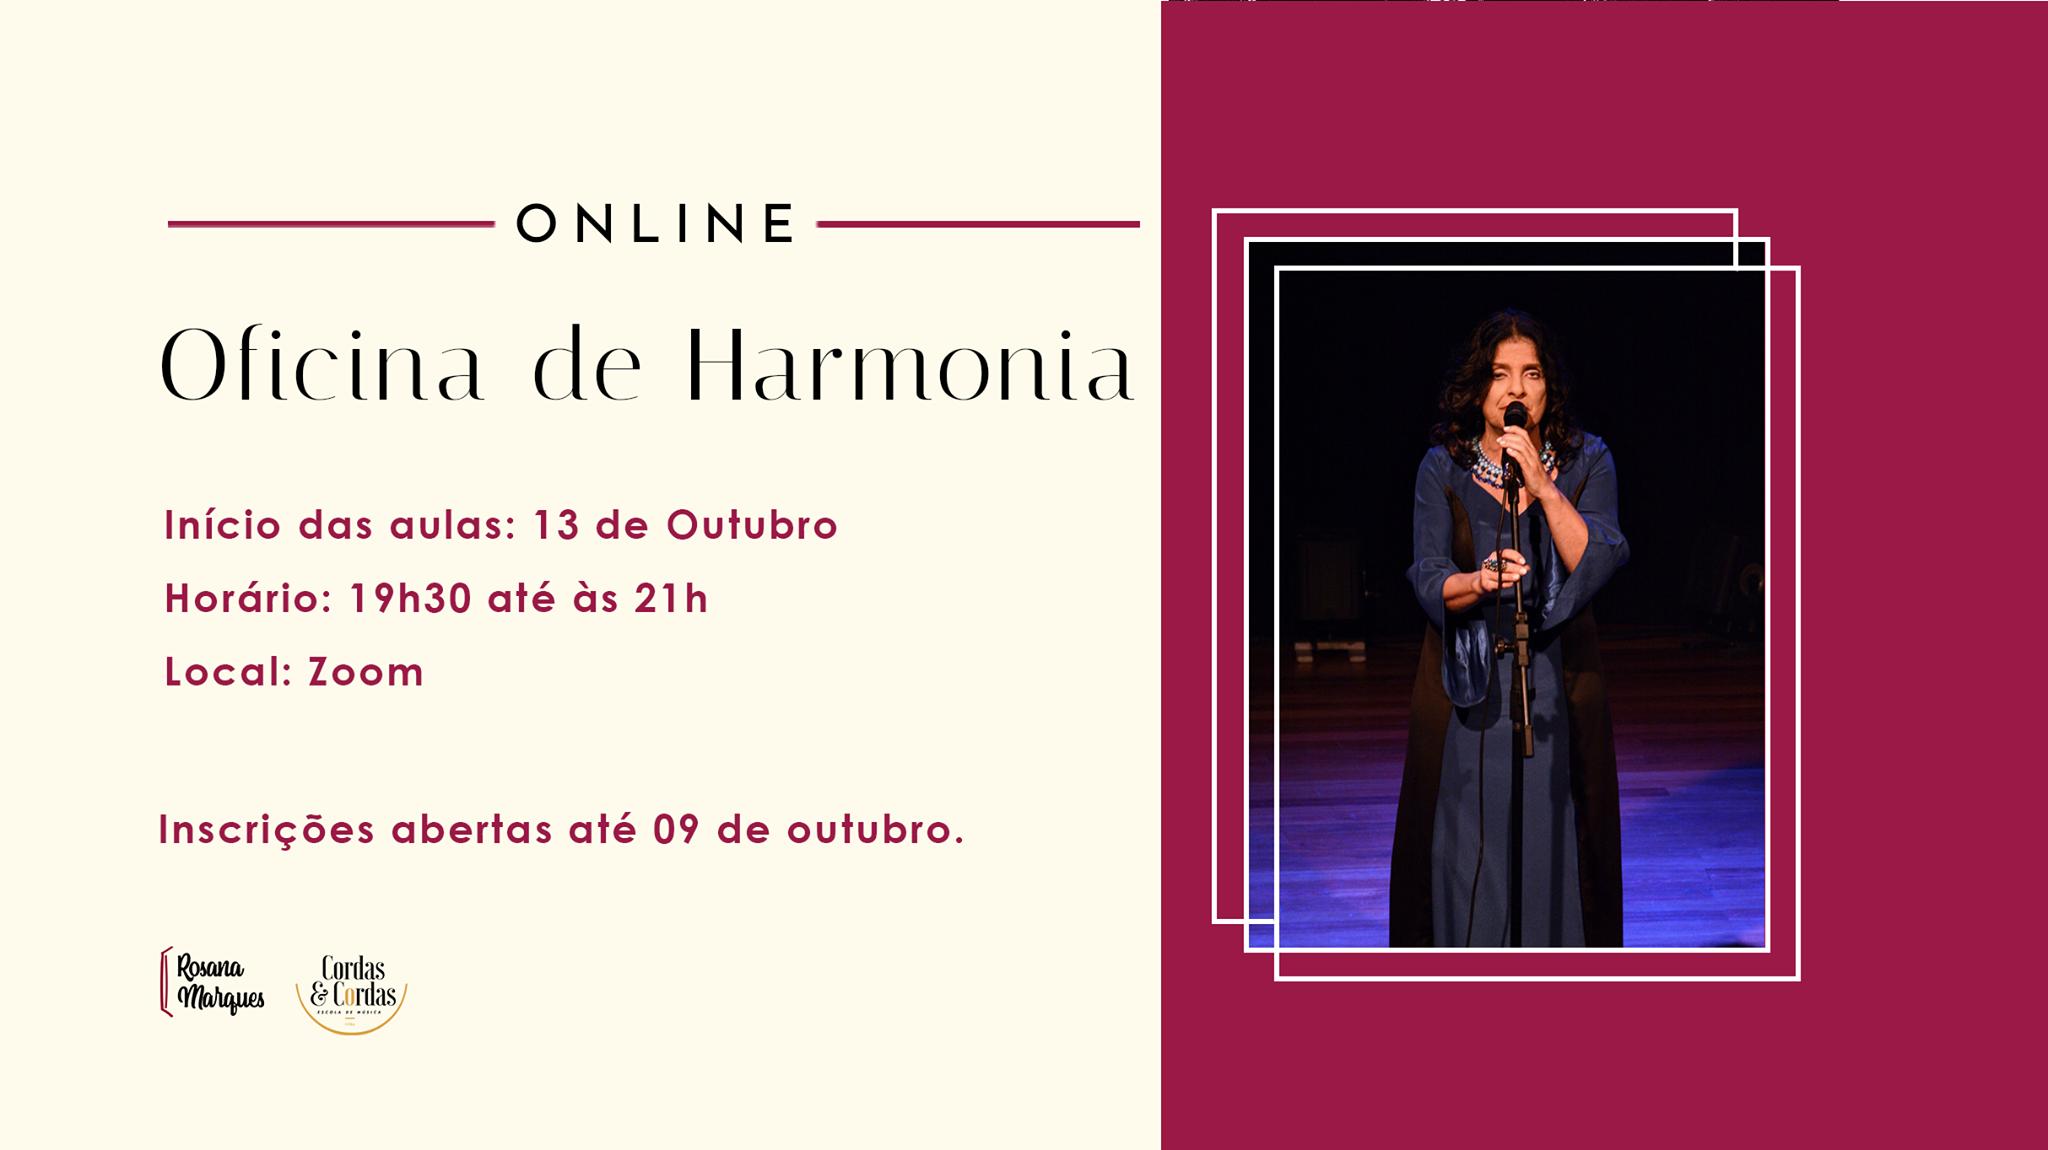 Oficina de Harmonia online